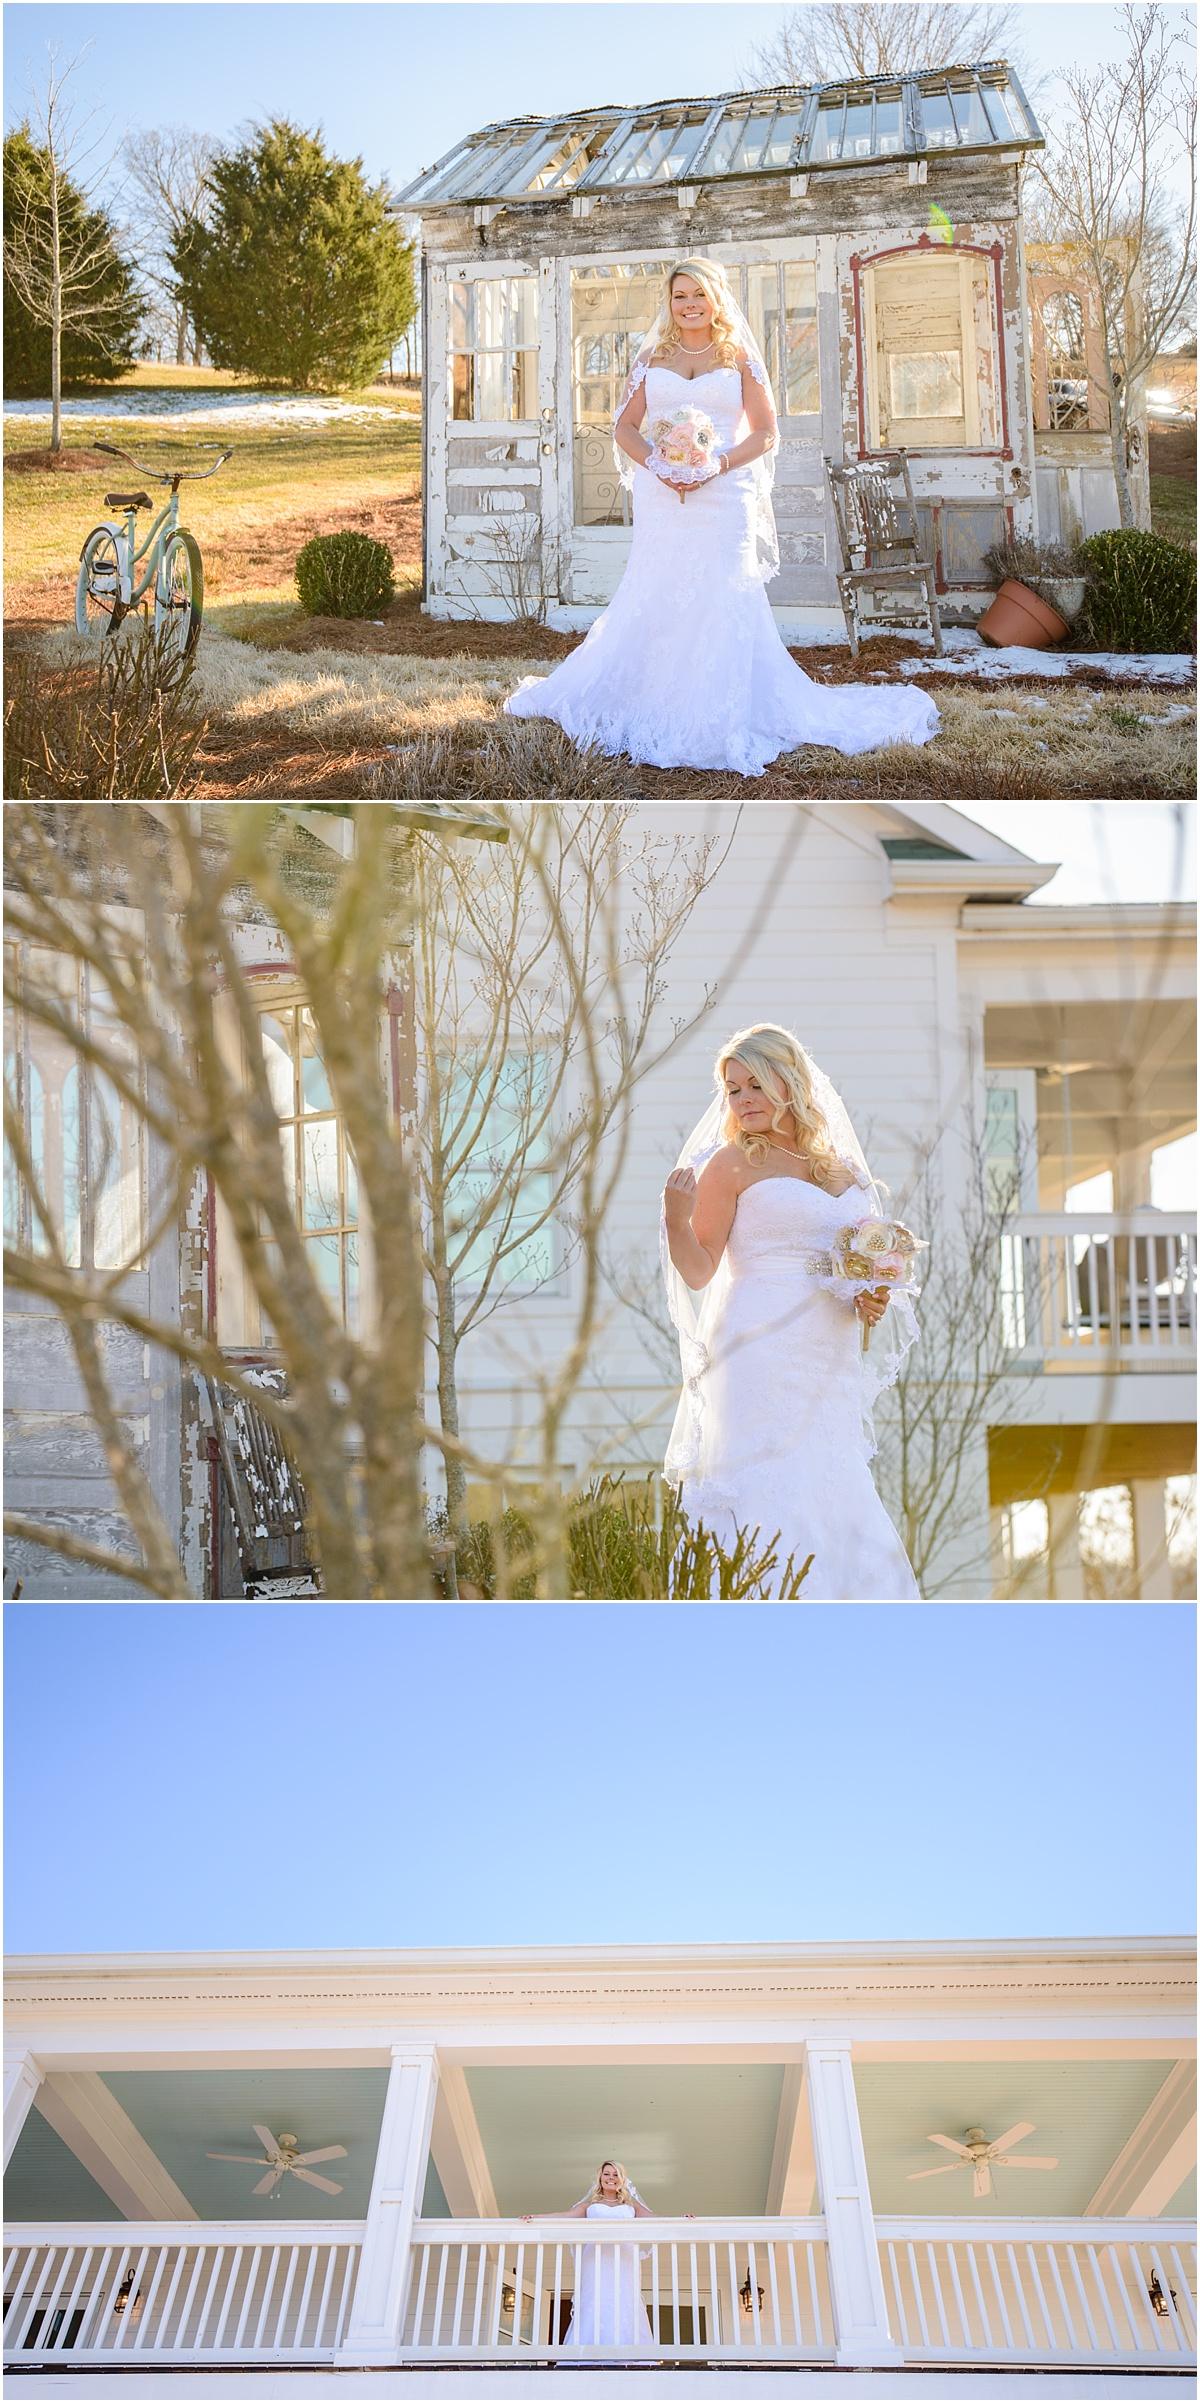 Greg Smit Photography Nashville wedding photographer Mint Springs Farm_0257